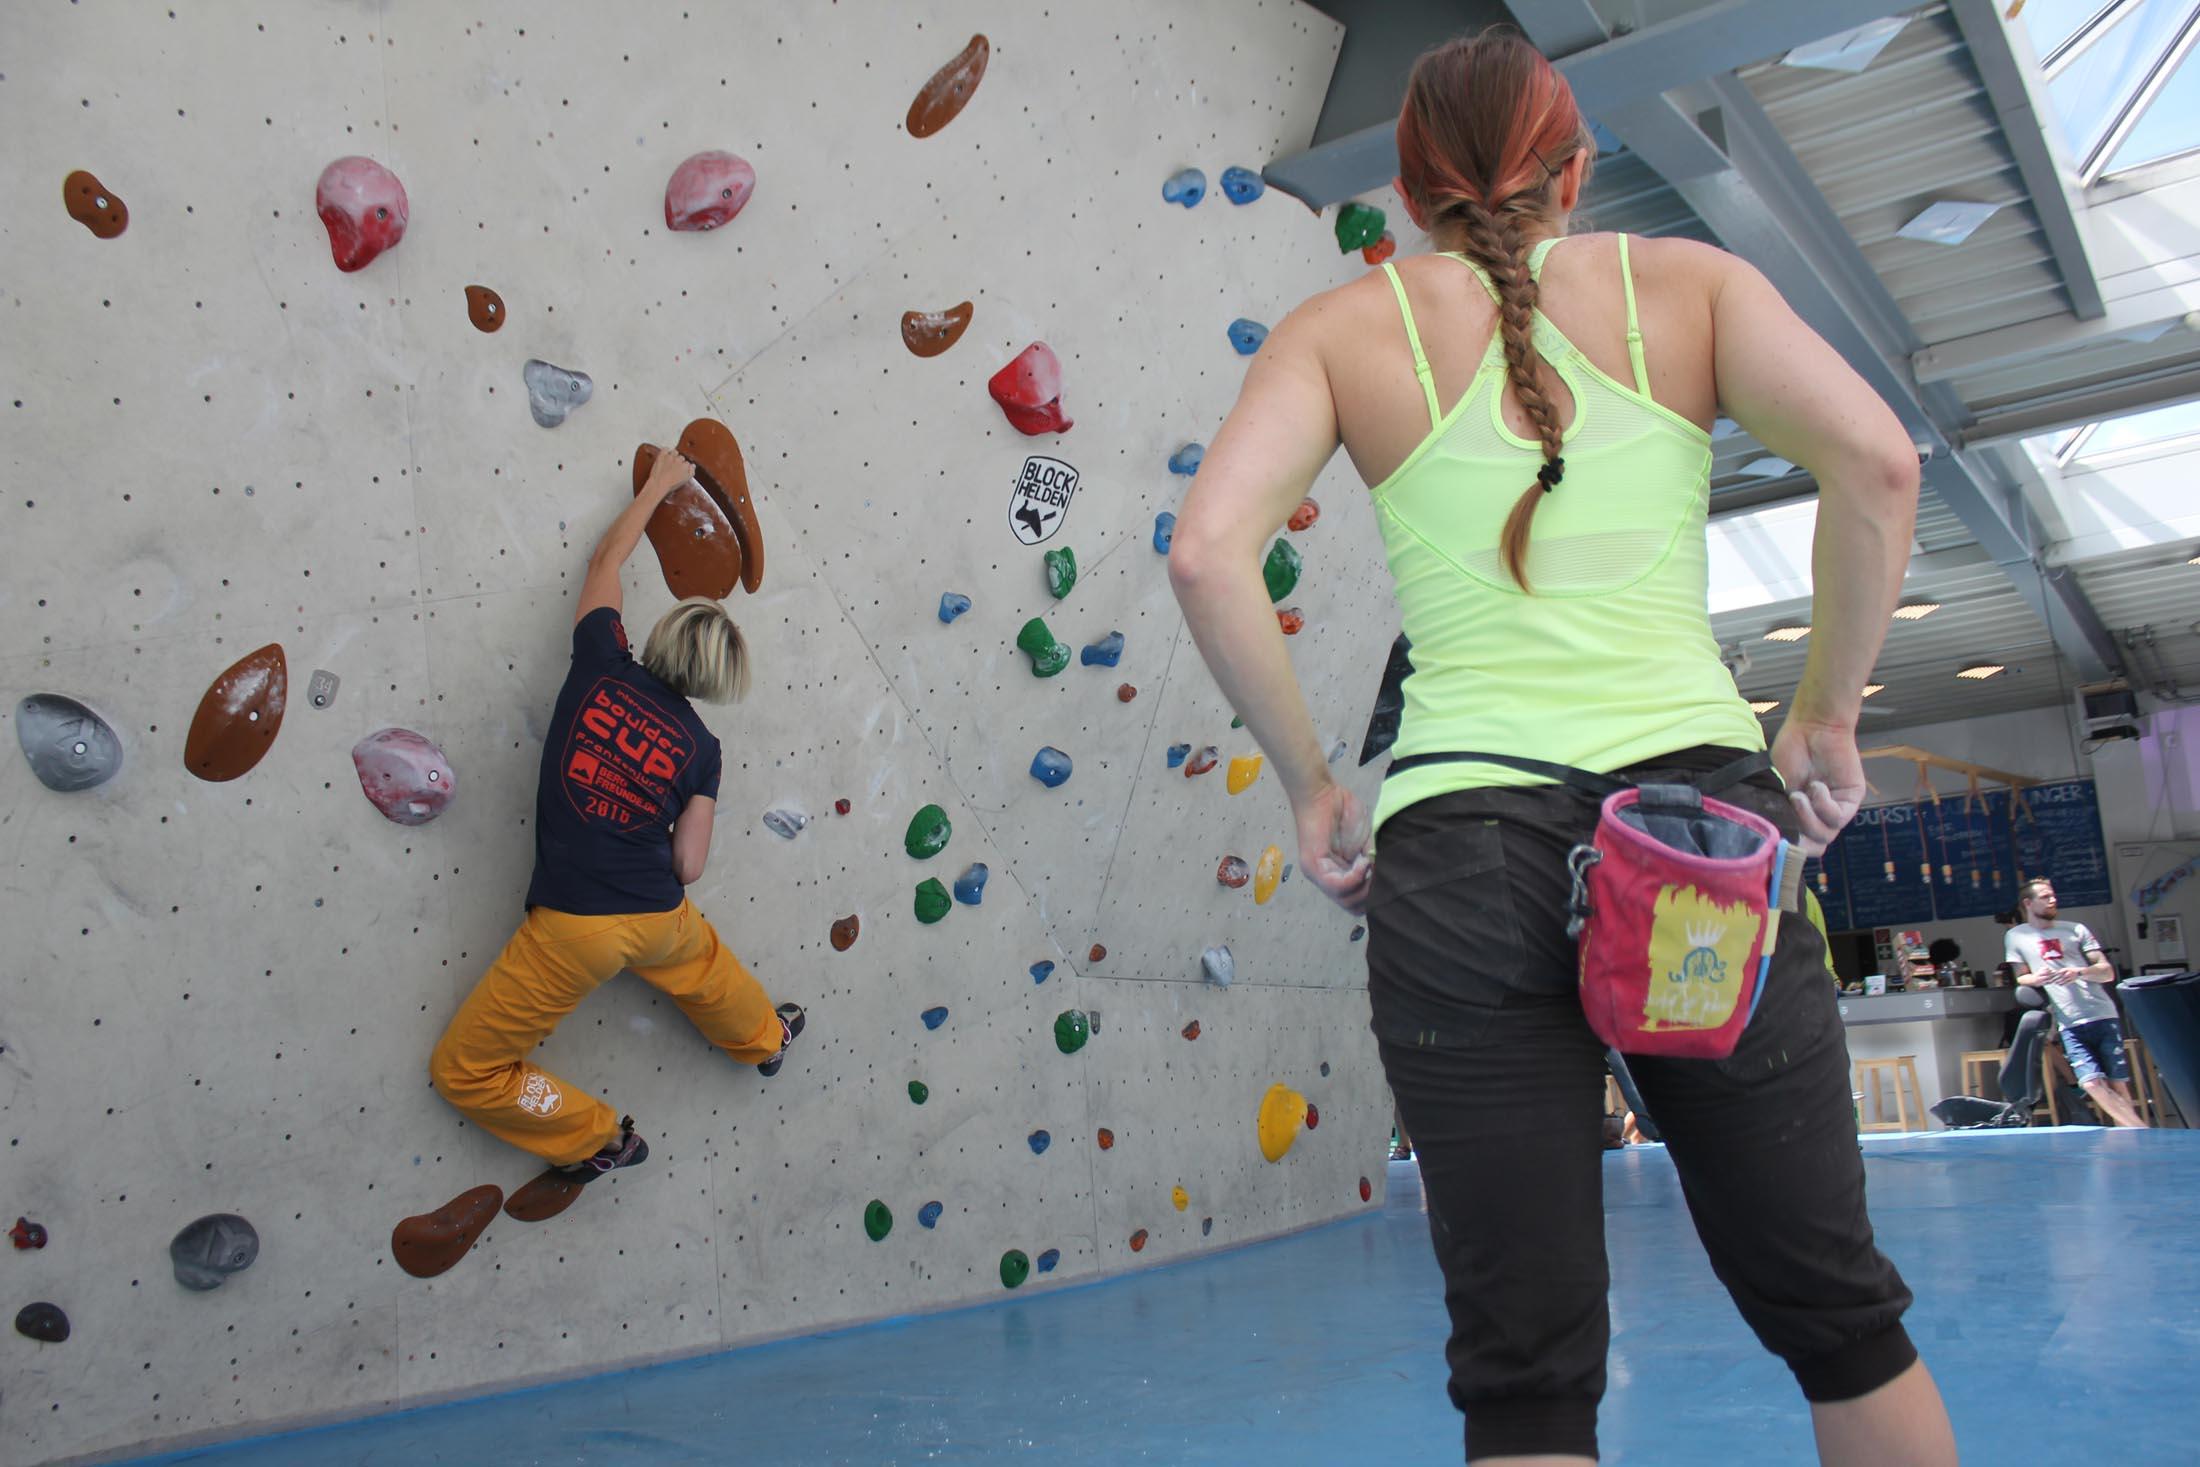 Quali, internationaler bouldercup Frankenjura 2016, BLOCKHELDEN Erlangen, Mammut, Bergfreunde.de, Boulderwettkampf07092016112